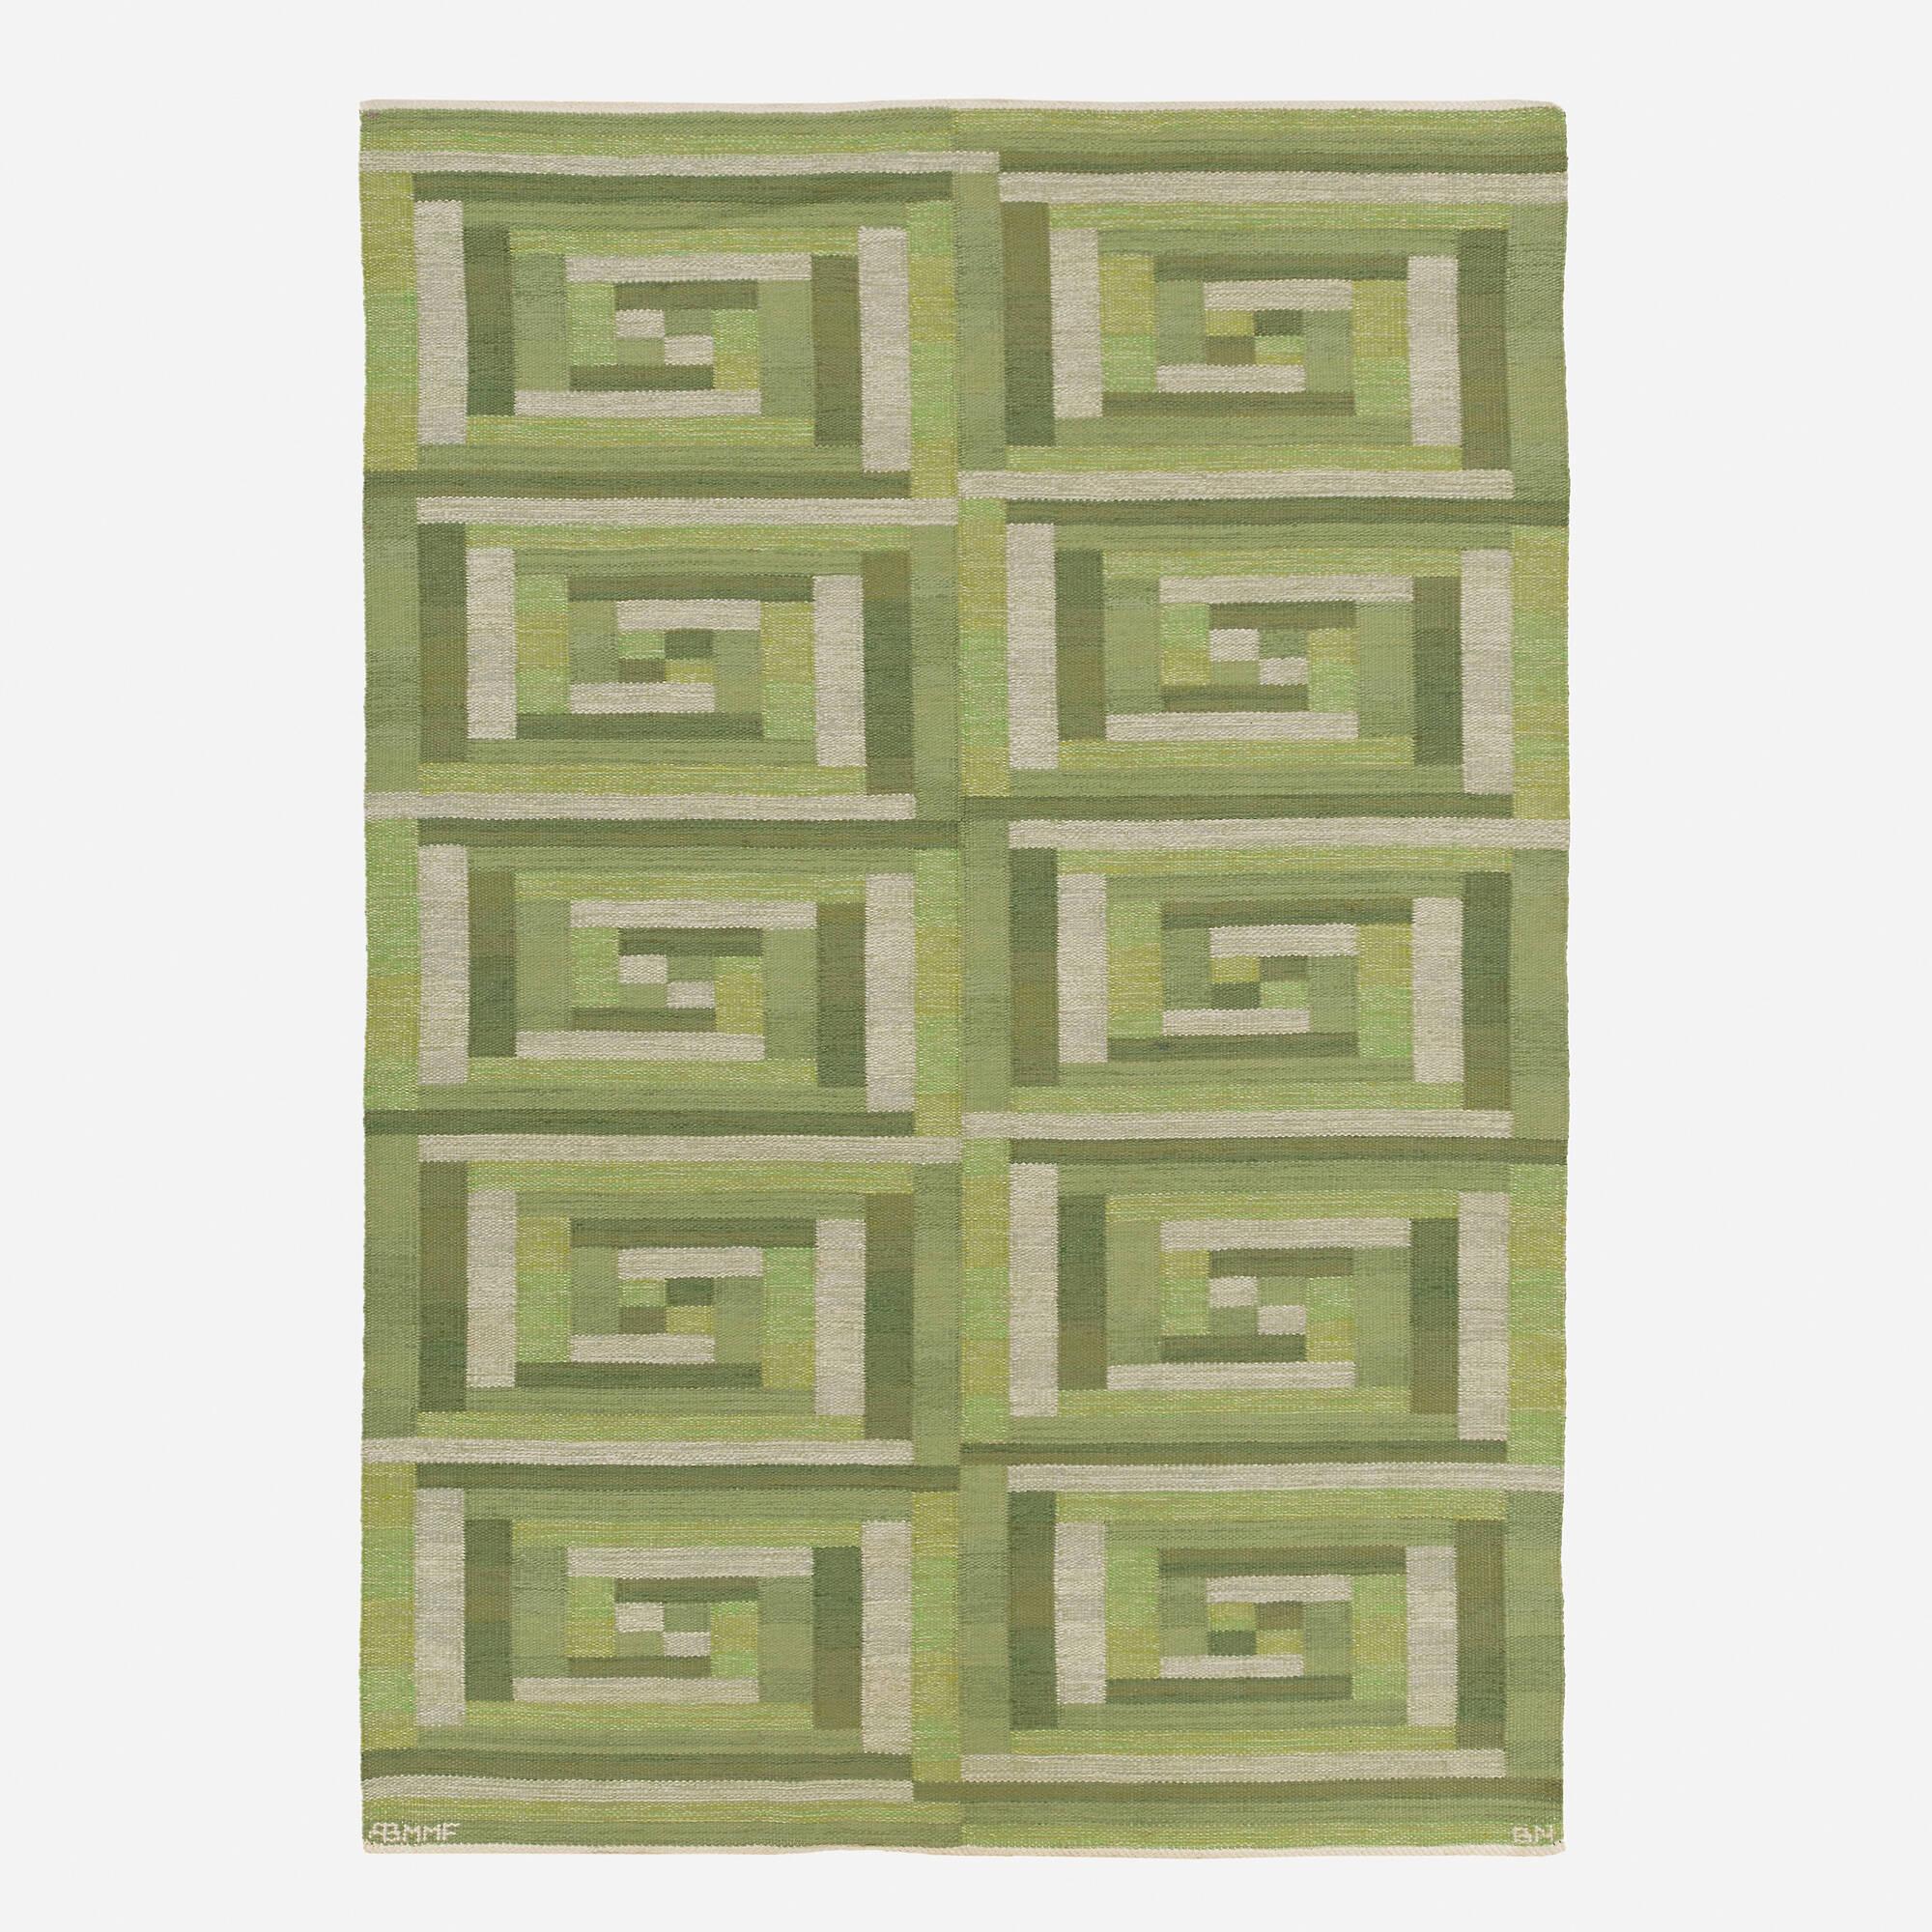 186: Barbro Nilsson / Ostia flatweave carpet (1 of 2)